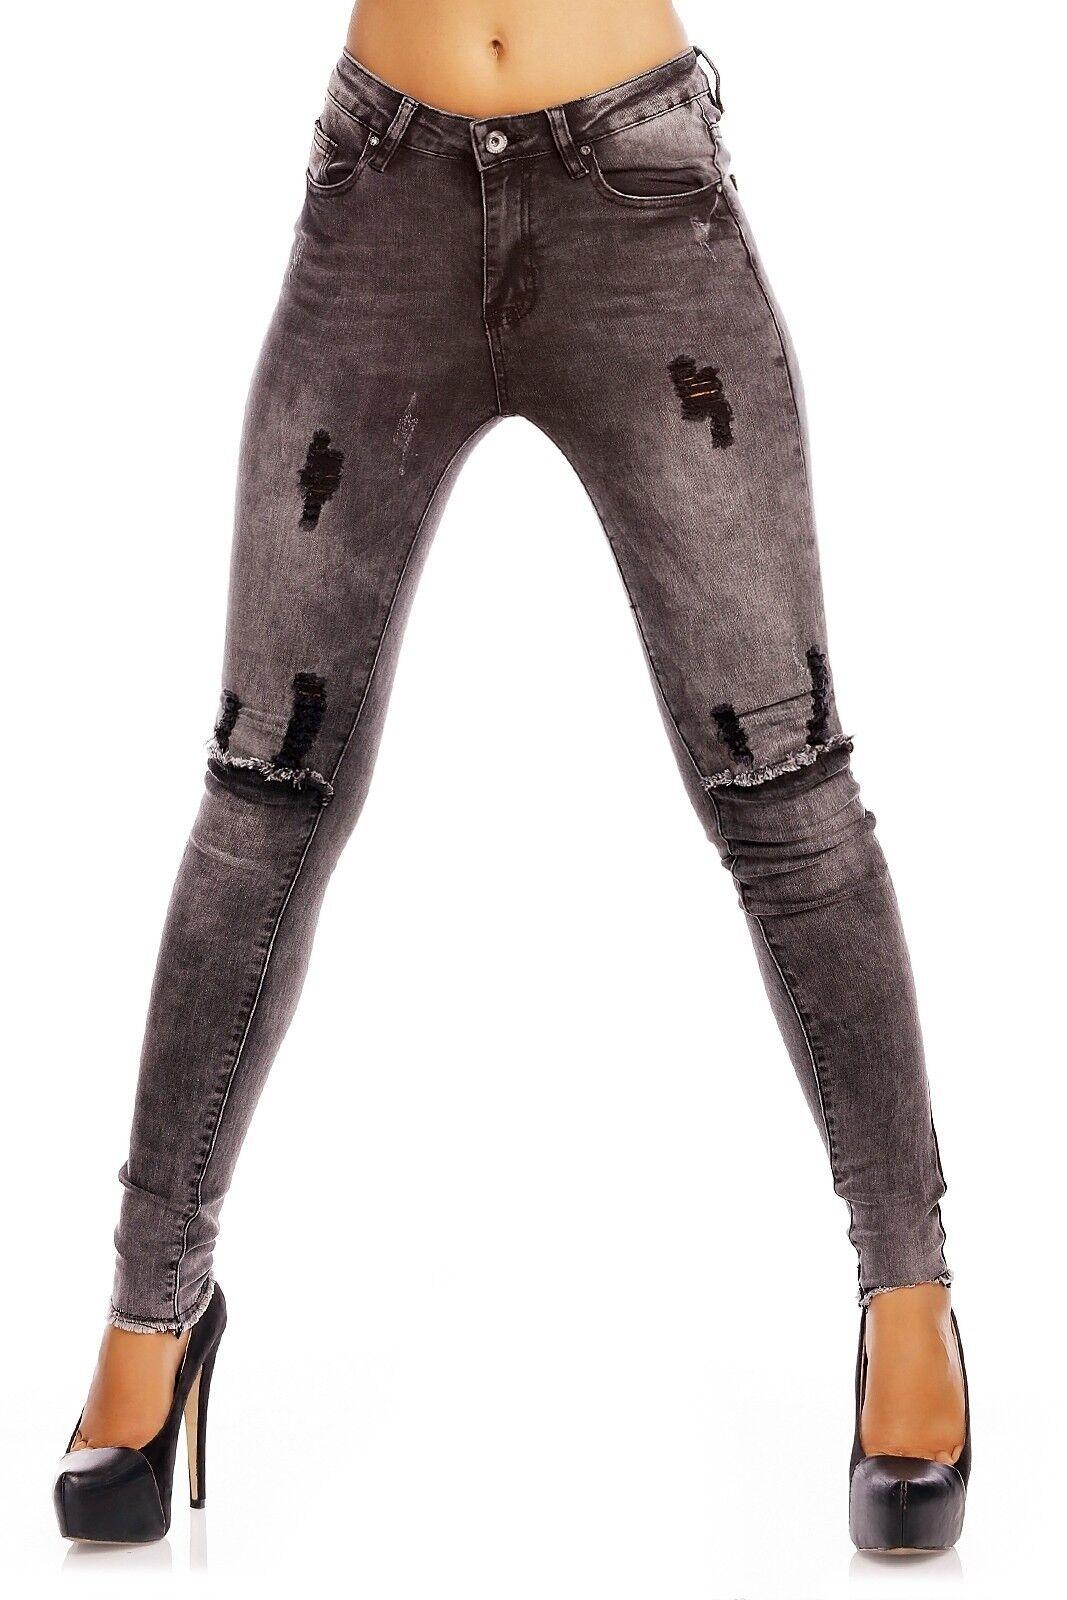 Laulia Destroyed Jeans stonewashed  grey   HIGH WAIST